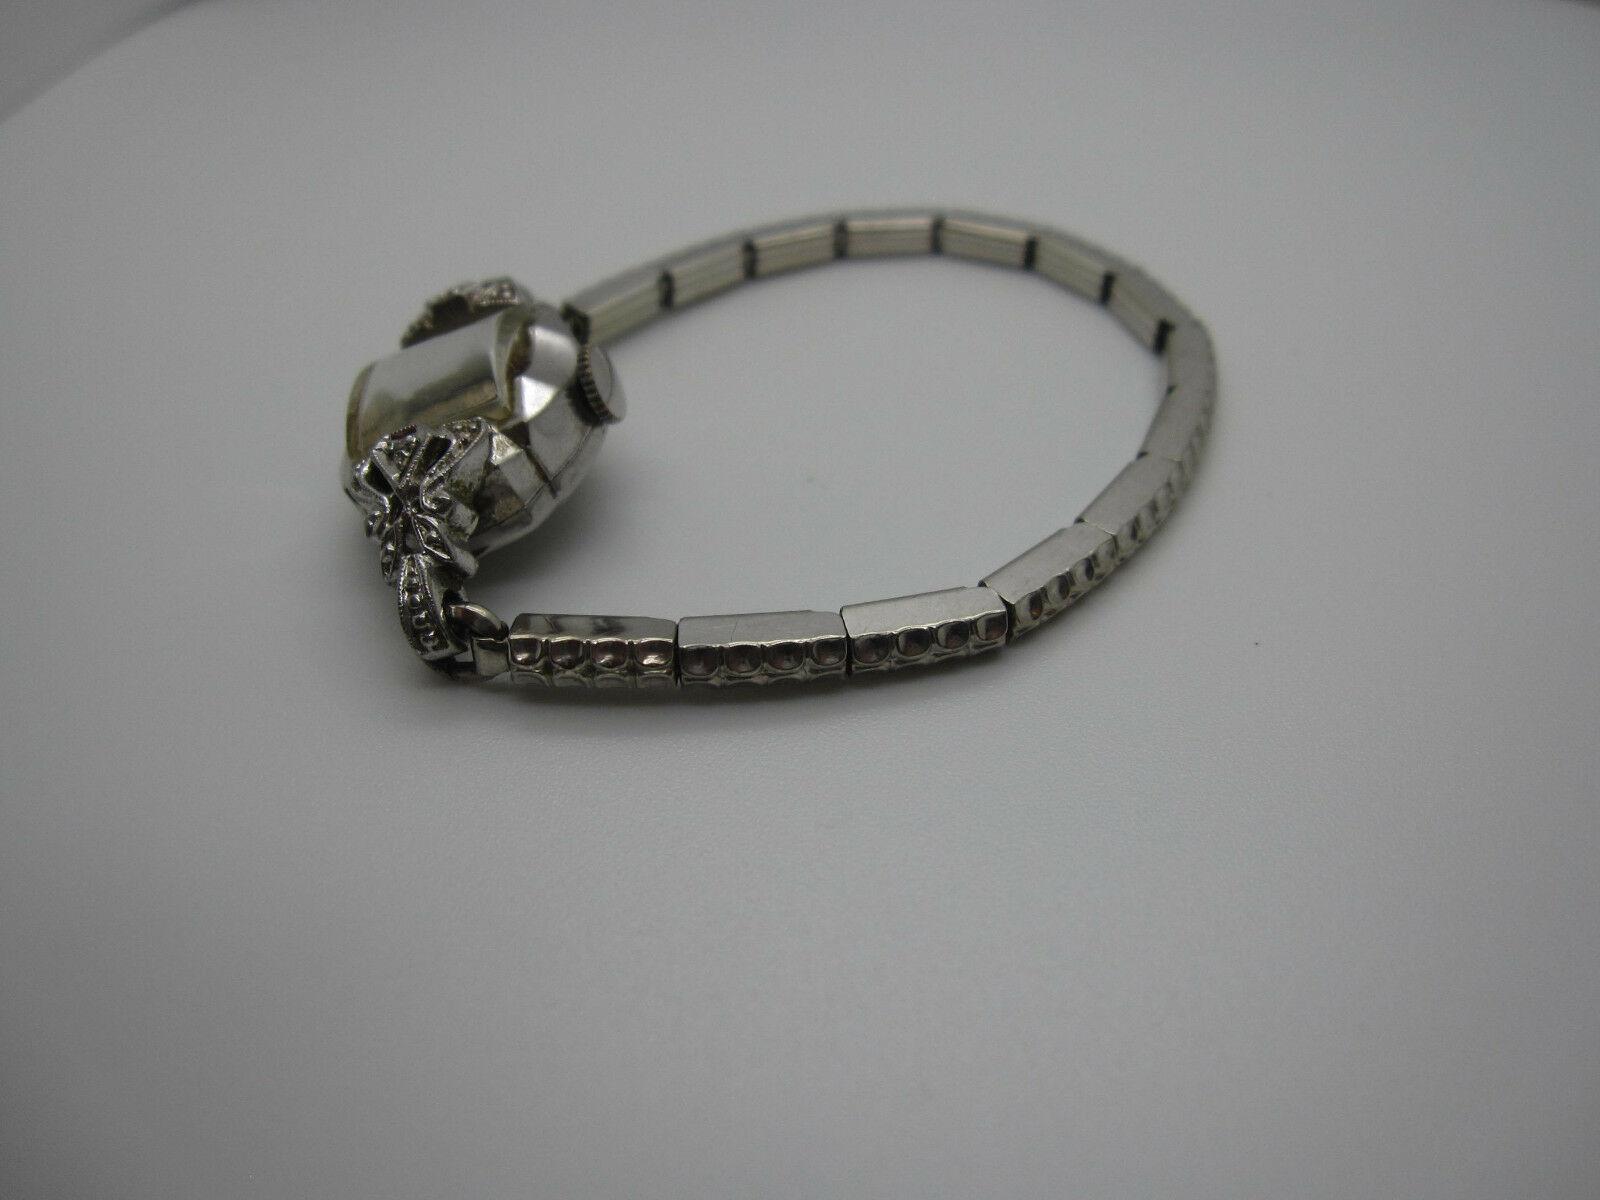 Vintage Women's Hallmark 25 Jewels 10k Rolled Gold Plated Hand Wind Watch image 10